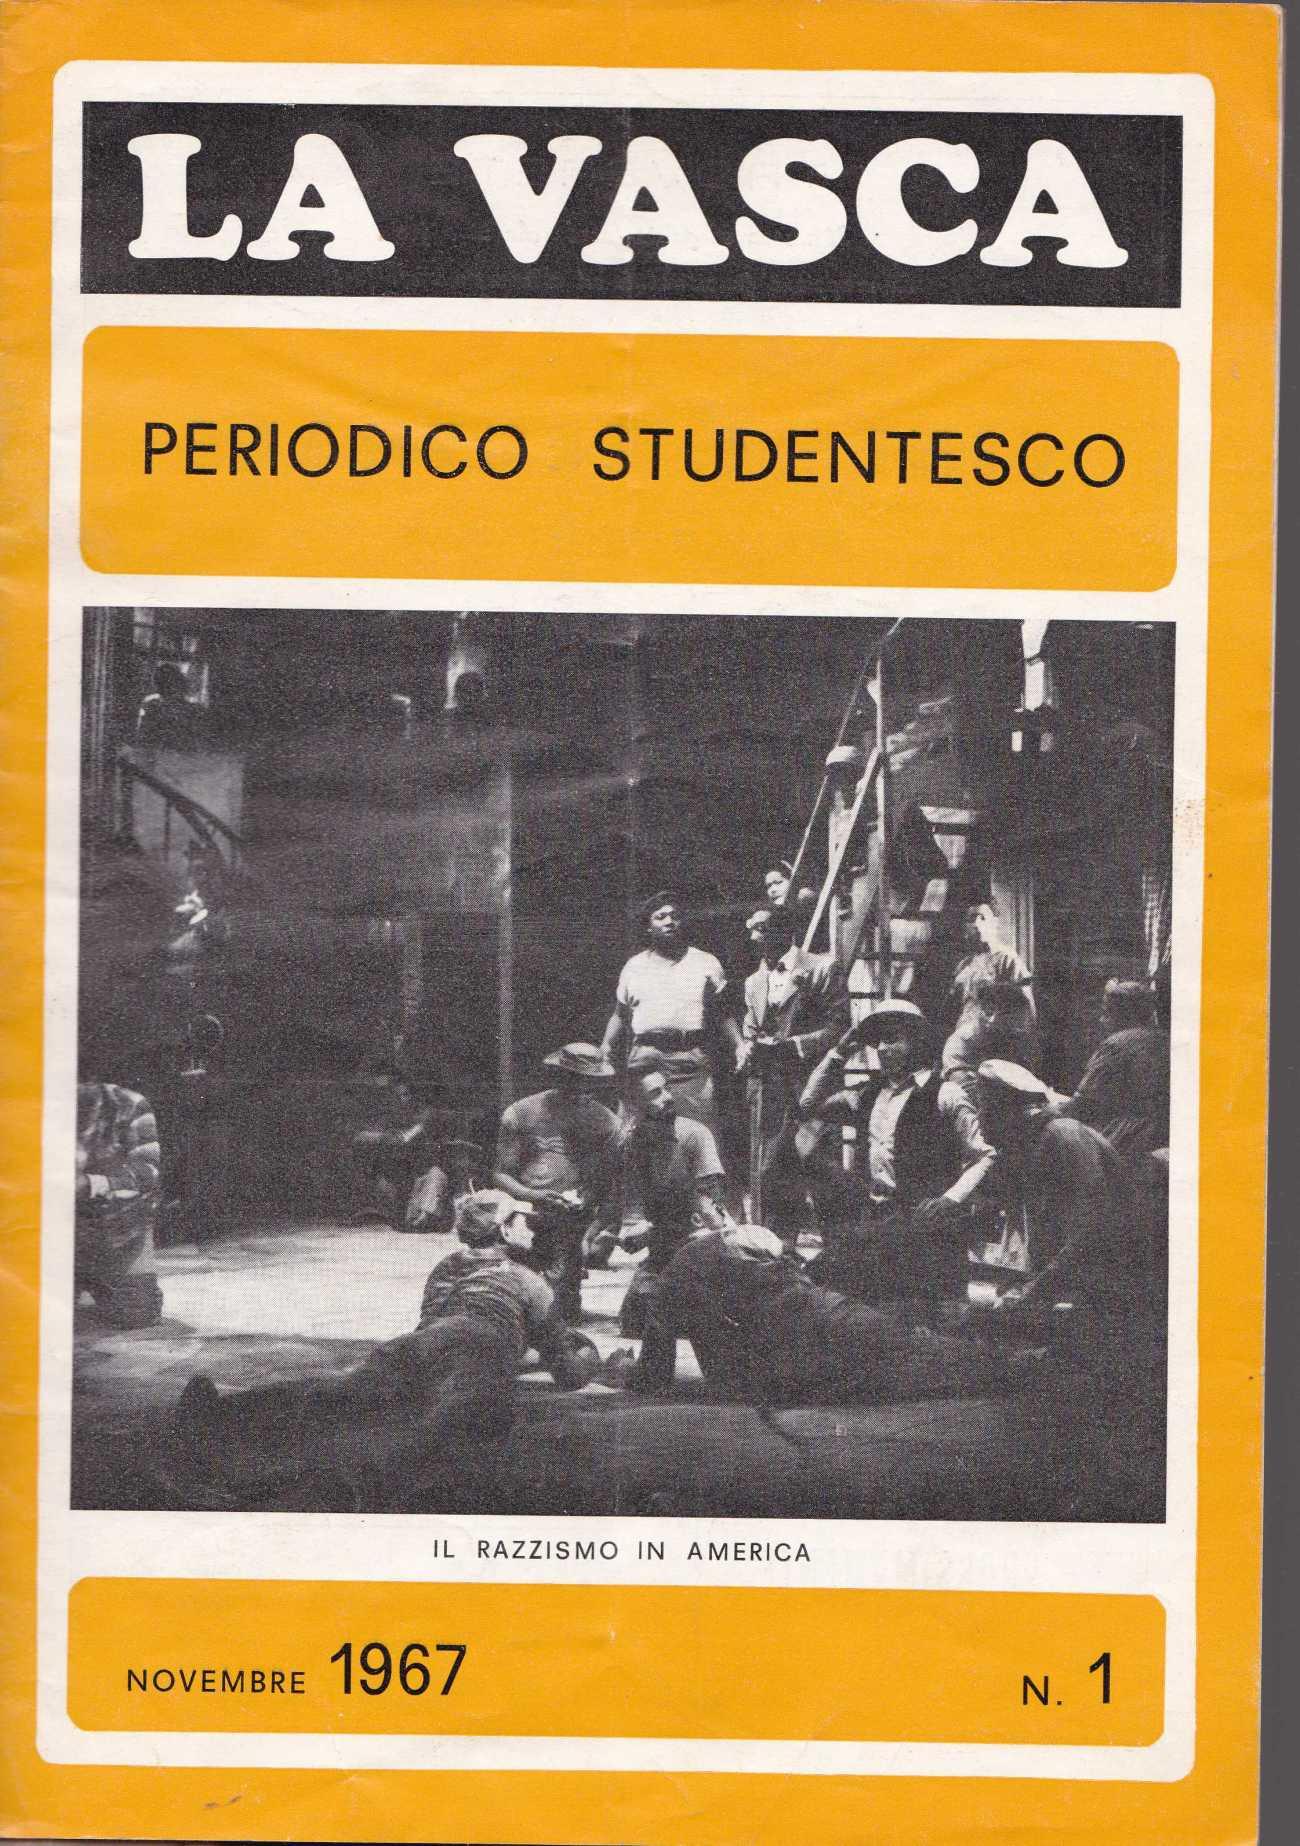 vasca 19673038